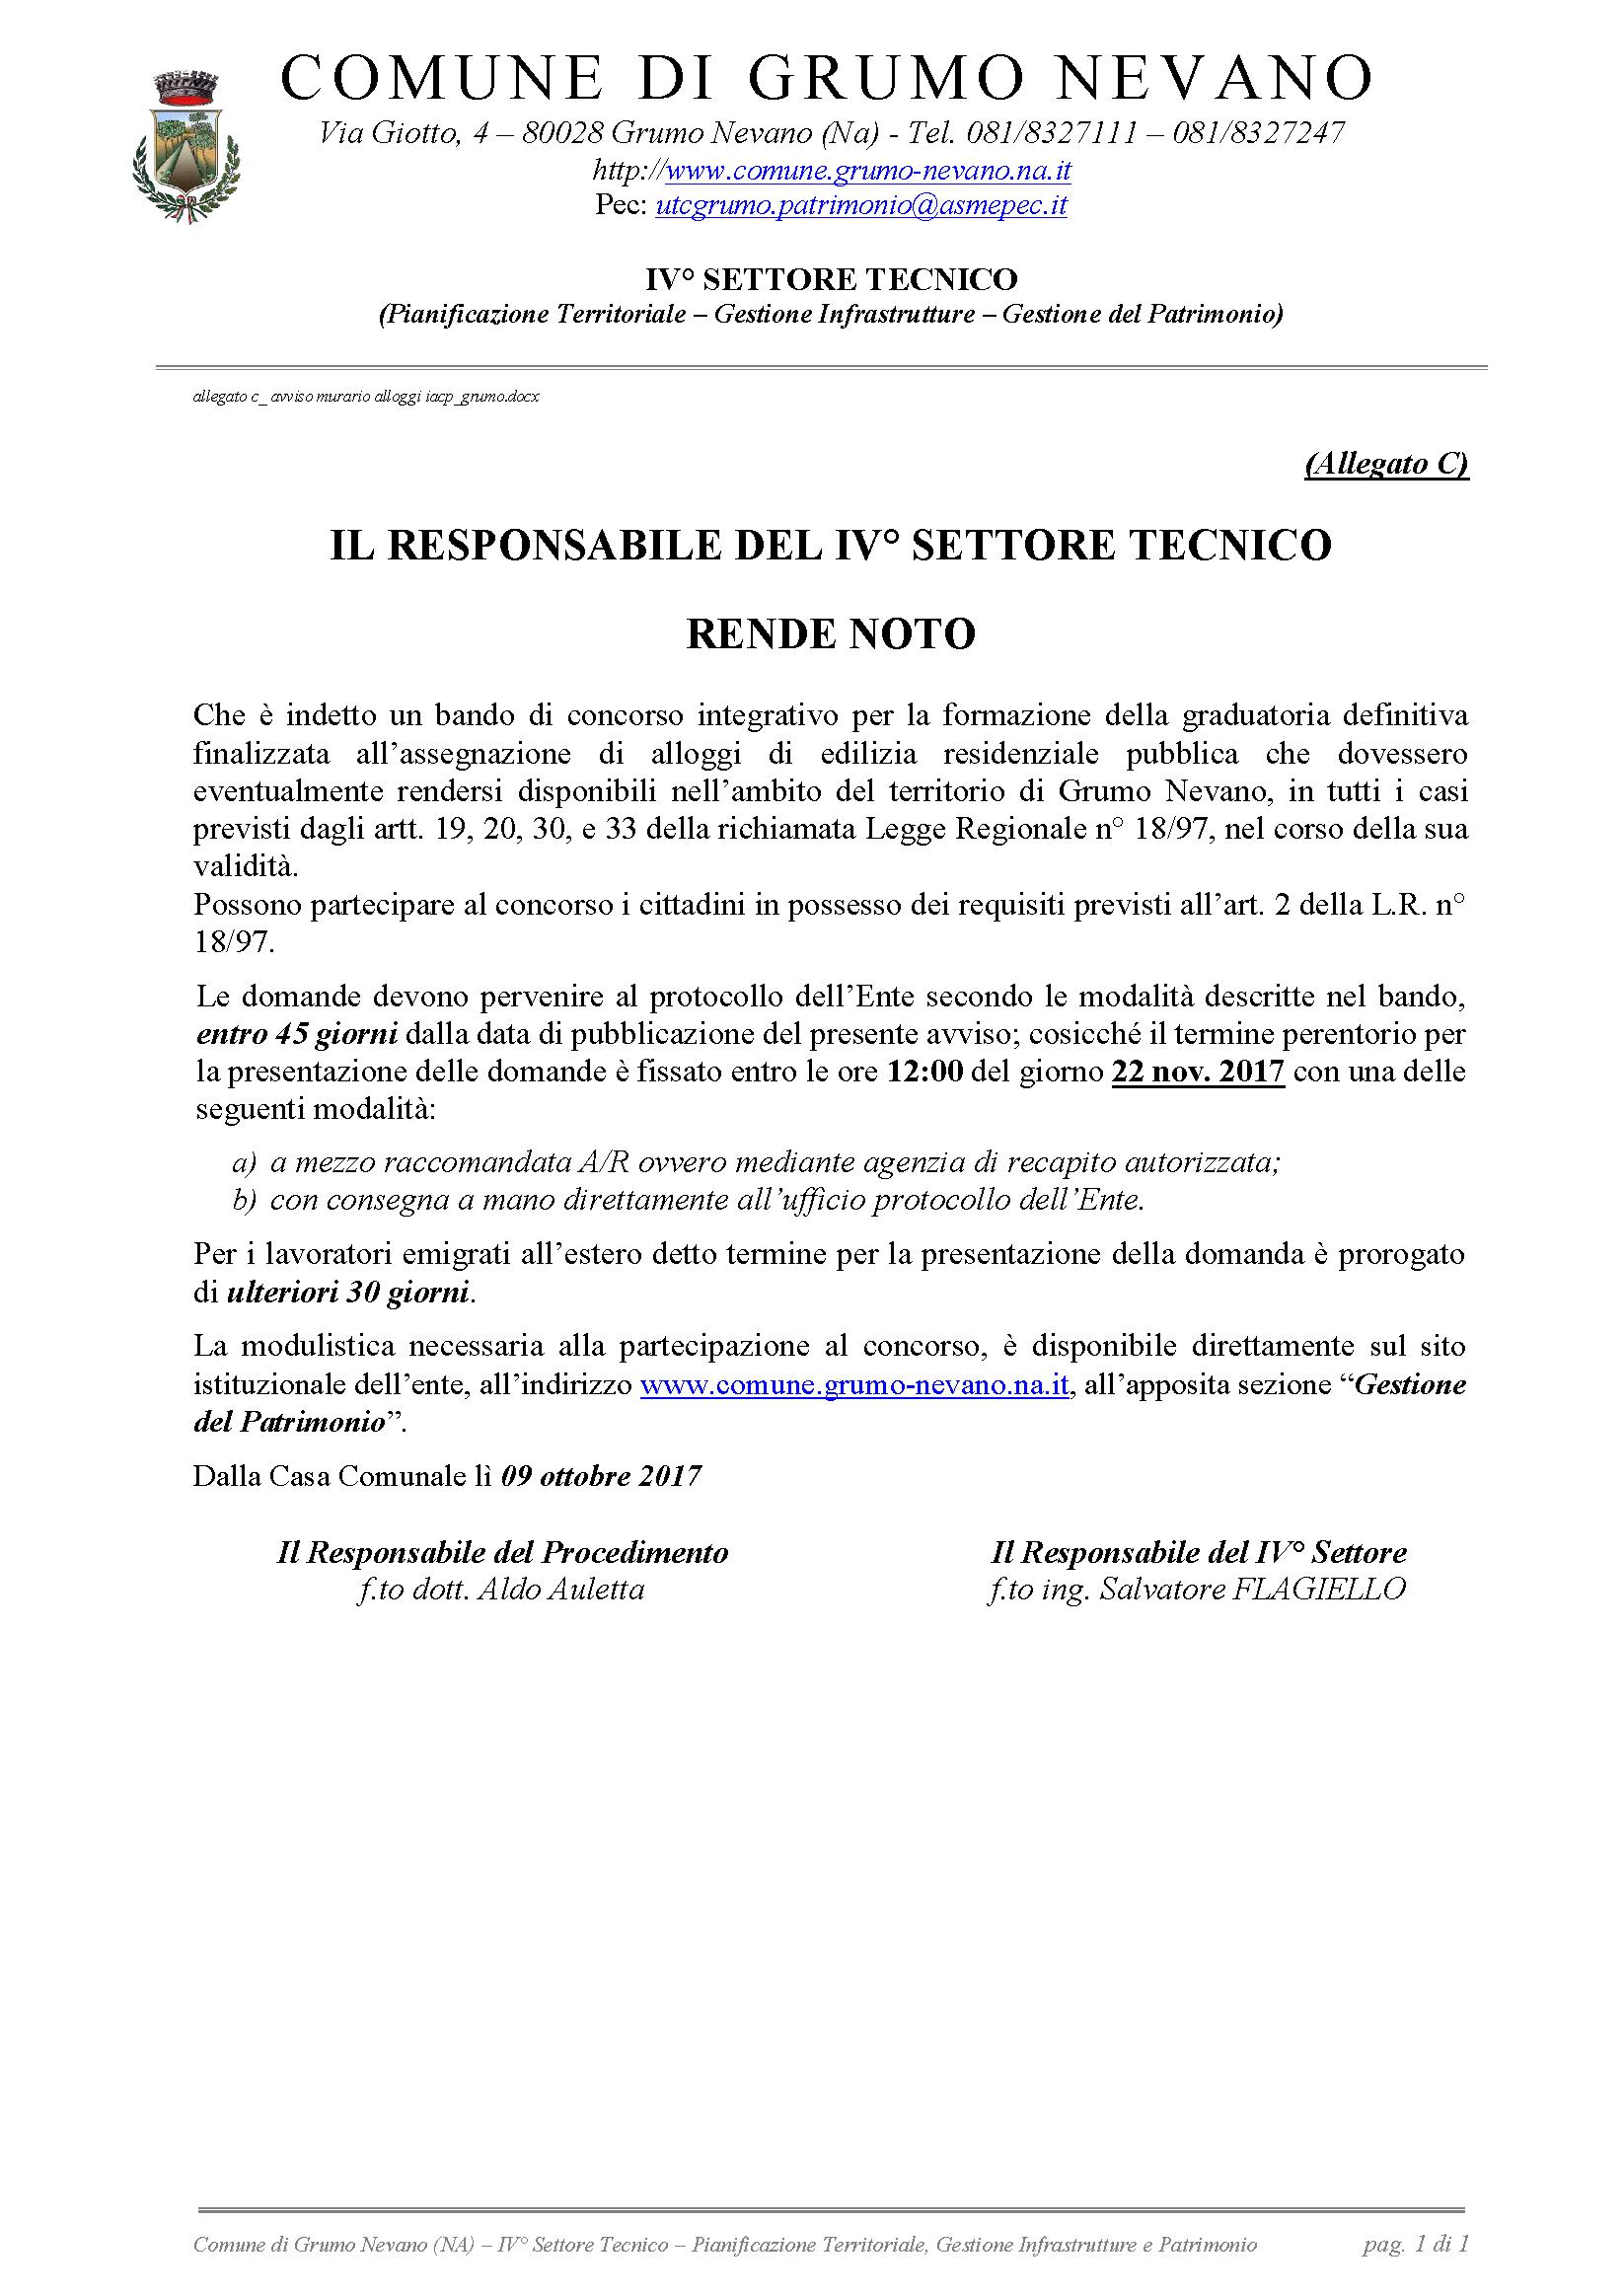 Allegato C_ Avviso murario Alloggi IACP_Grumo